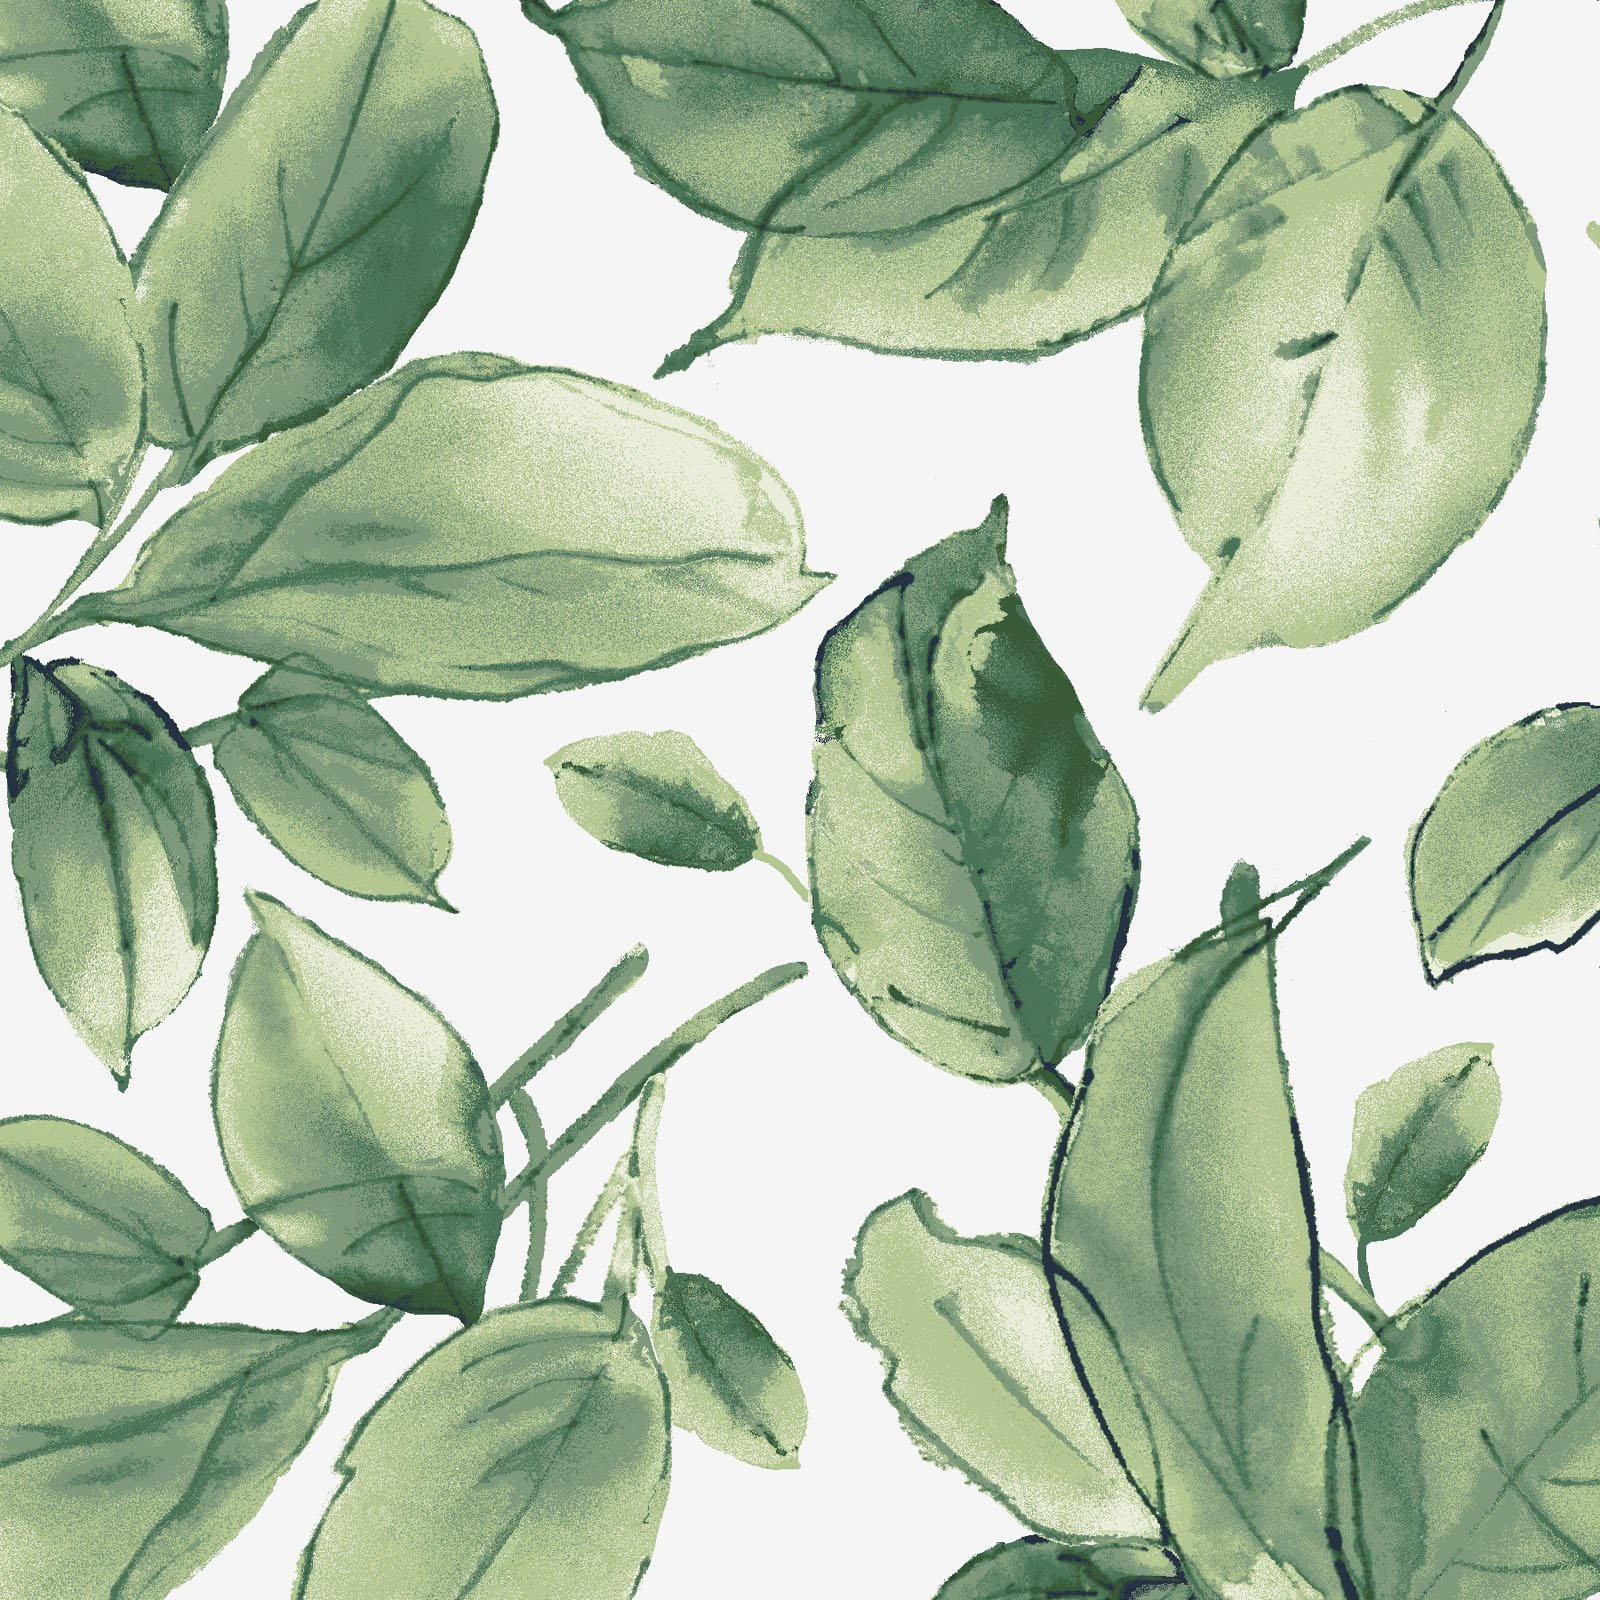 Watercolor Hydrangeas Green Leaves Fabric Yardage MAS9337-G